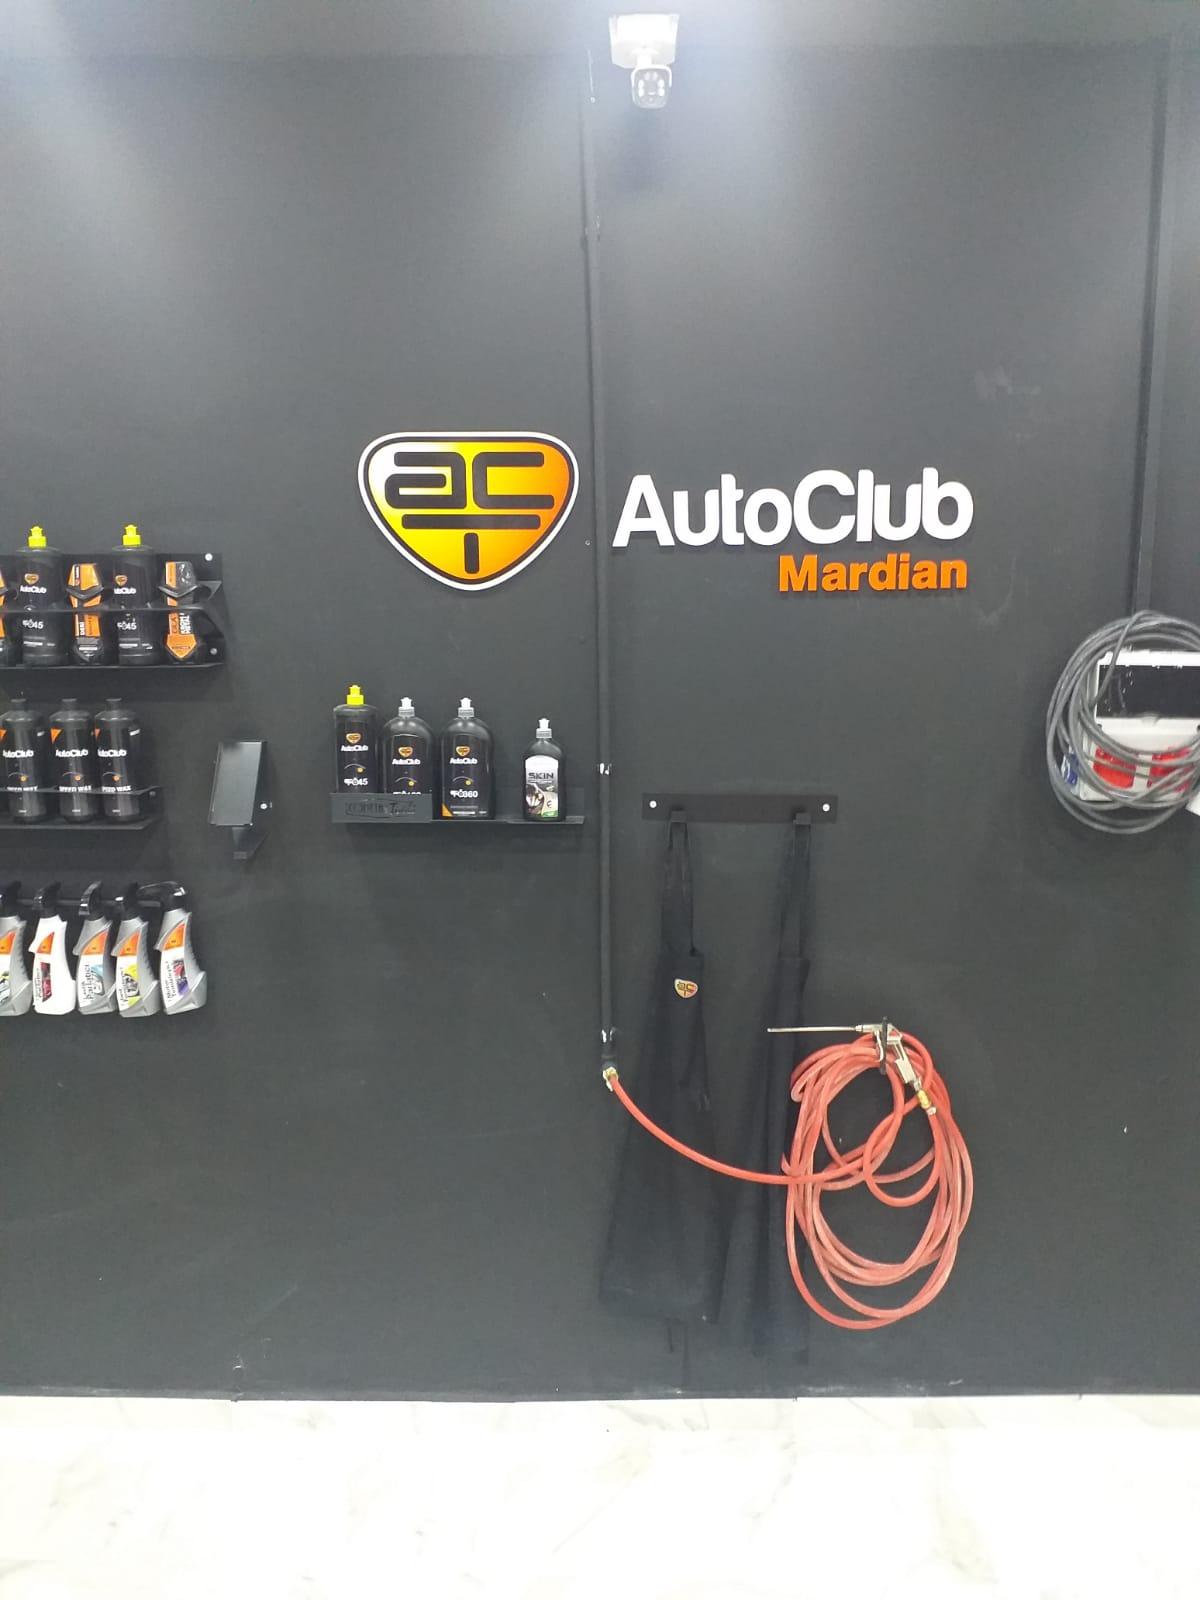 AutoClub Mardian - Mardin